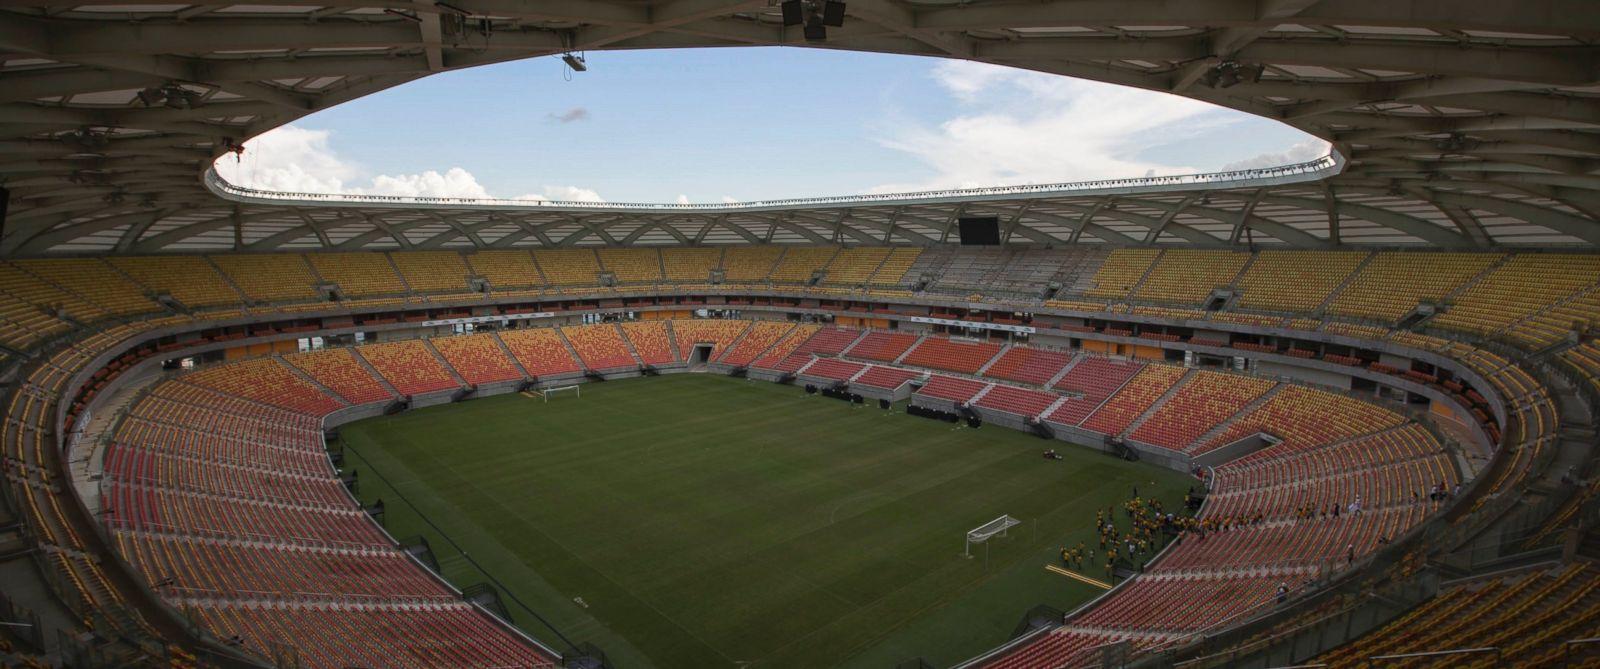 PHOTO: General view of the Arena da Amazonia soccer stadium in Manaus, Brazil, May 20, 2014. .